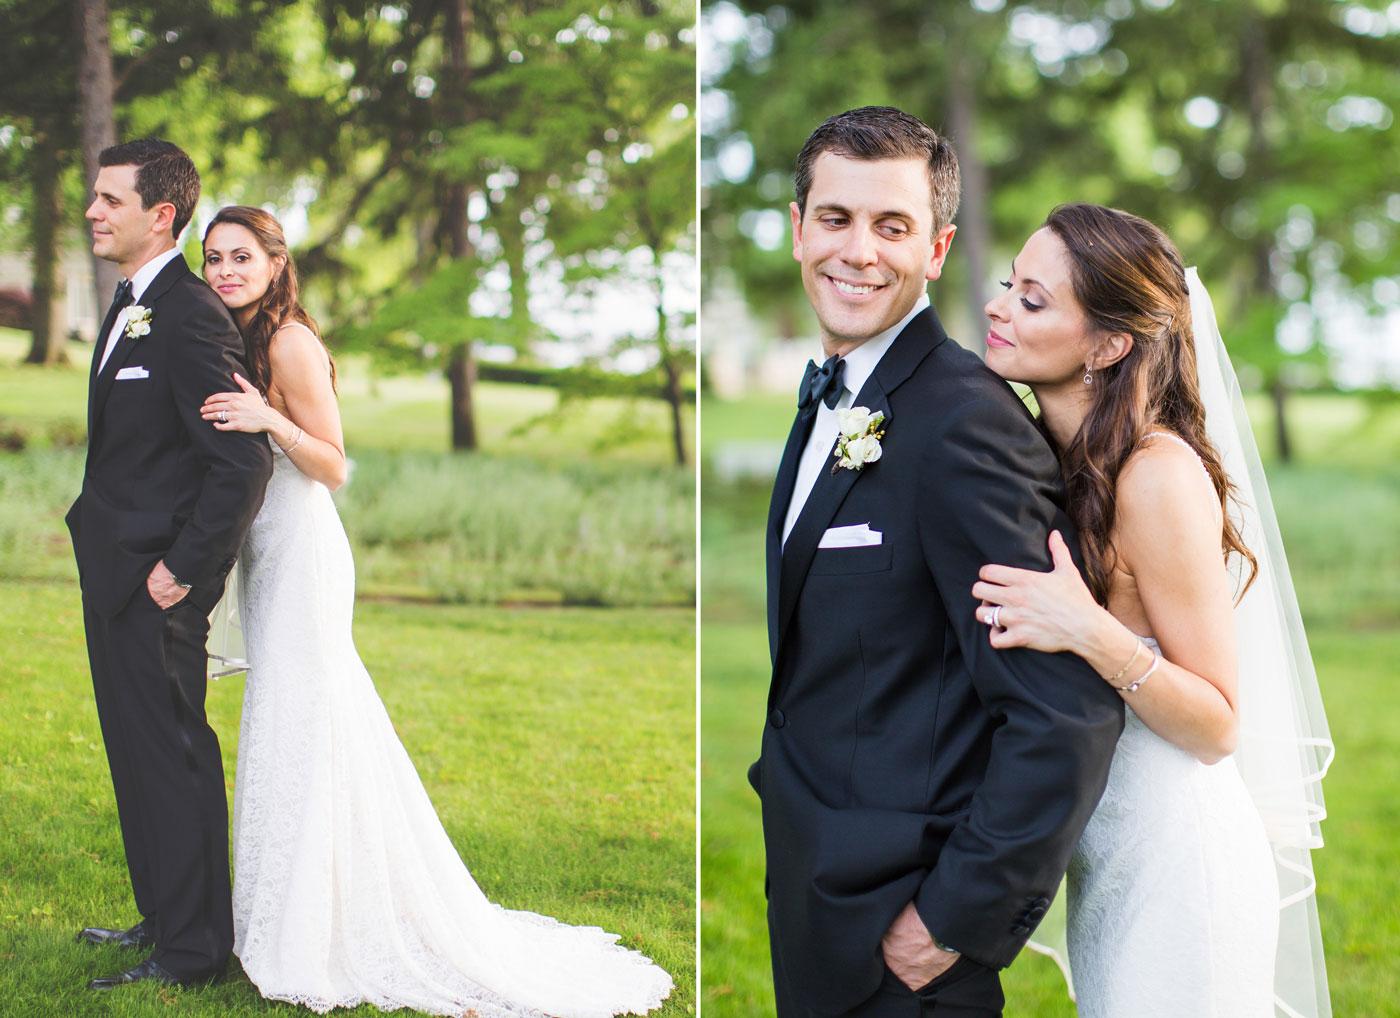 New-York-Wedding-Photographer38.jpg